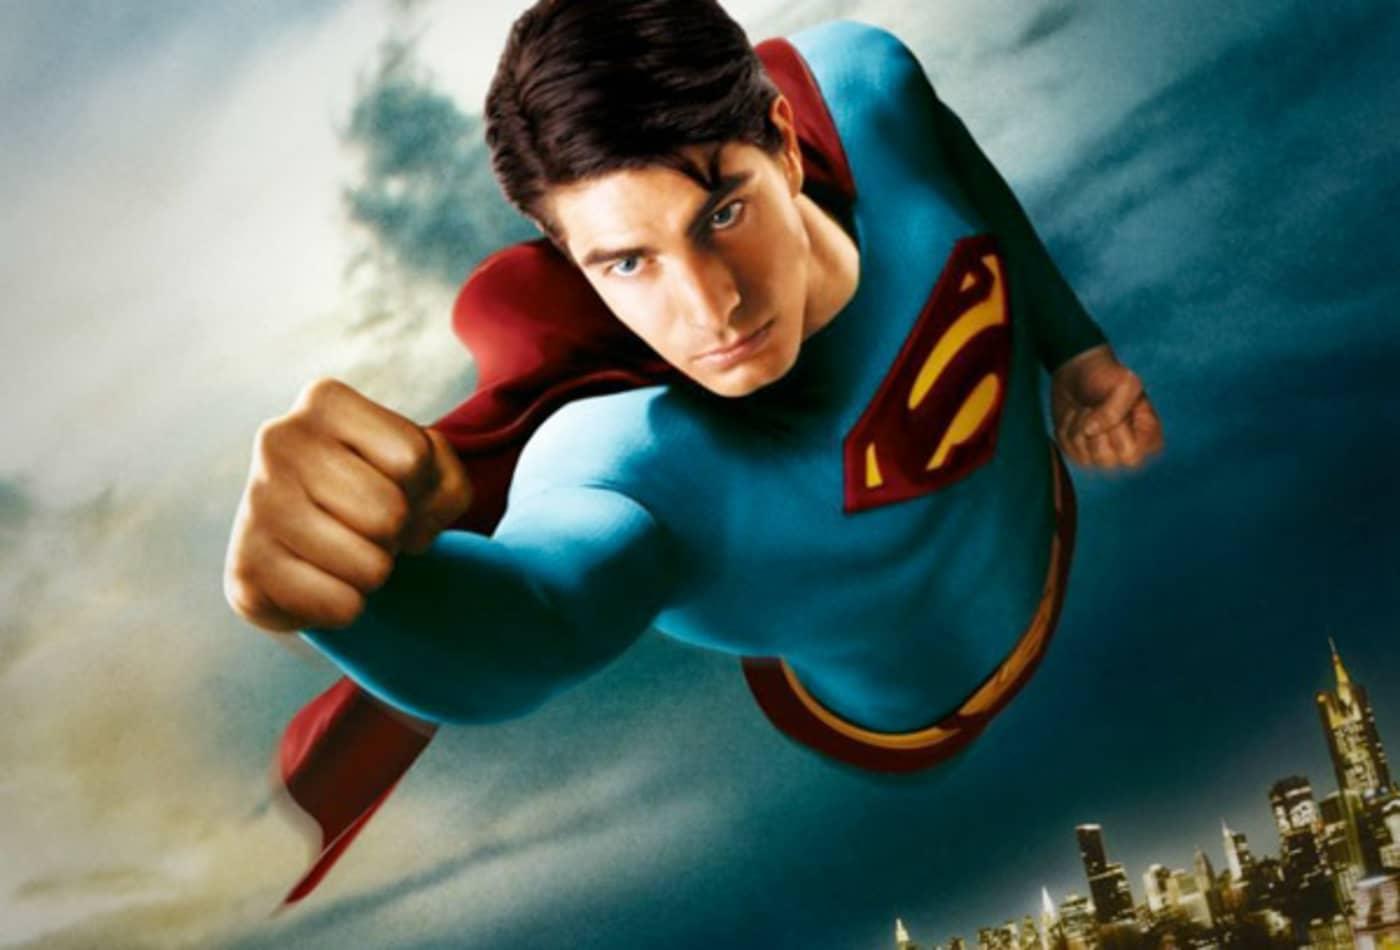 46955355 CNBC_superhero_films_2011_Superman.jpg